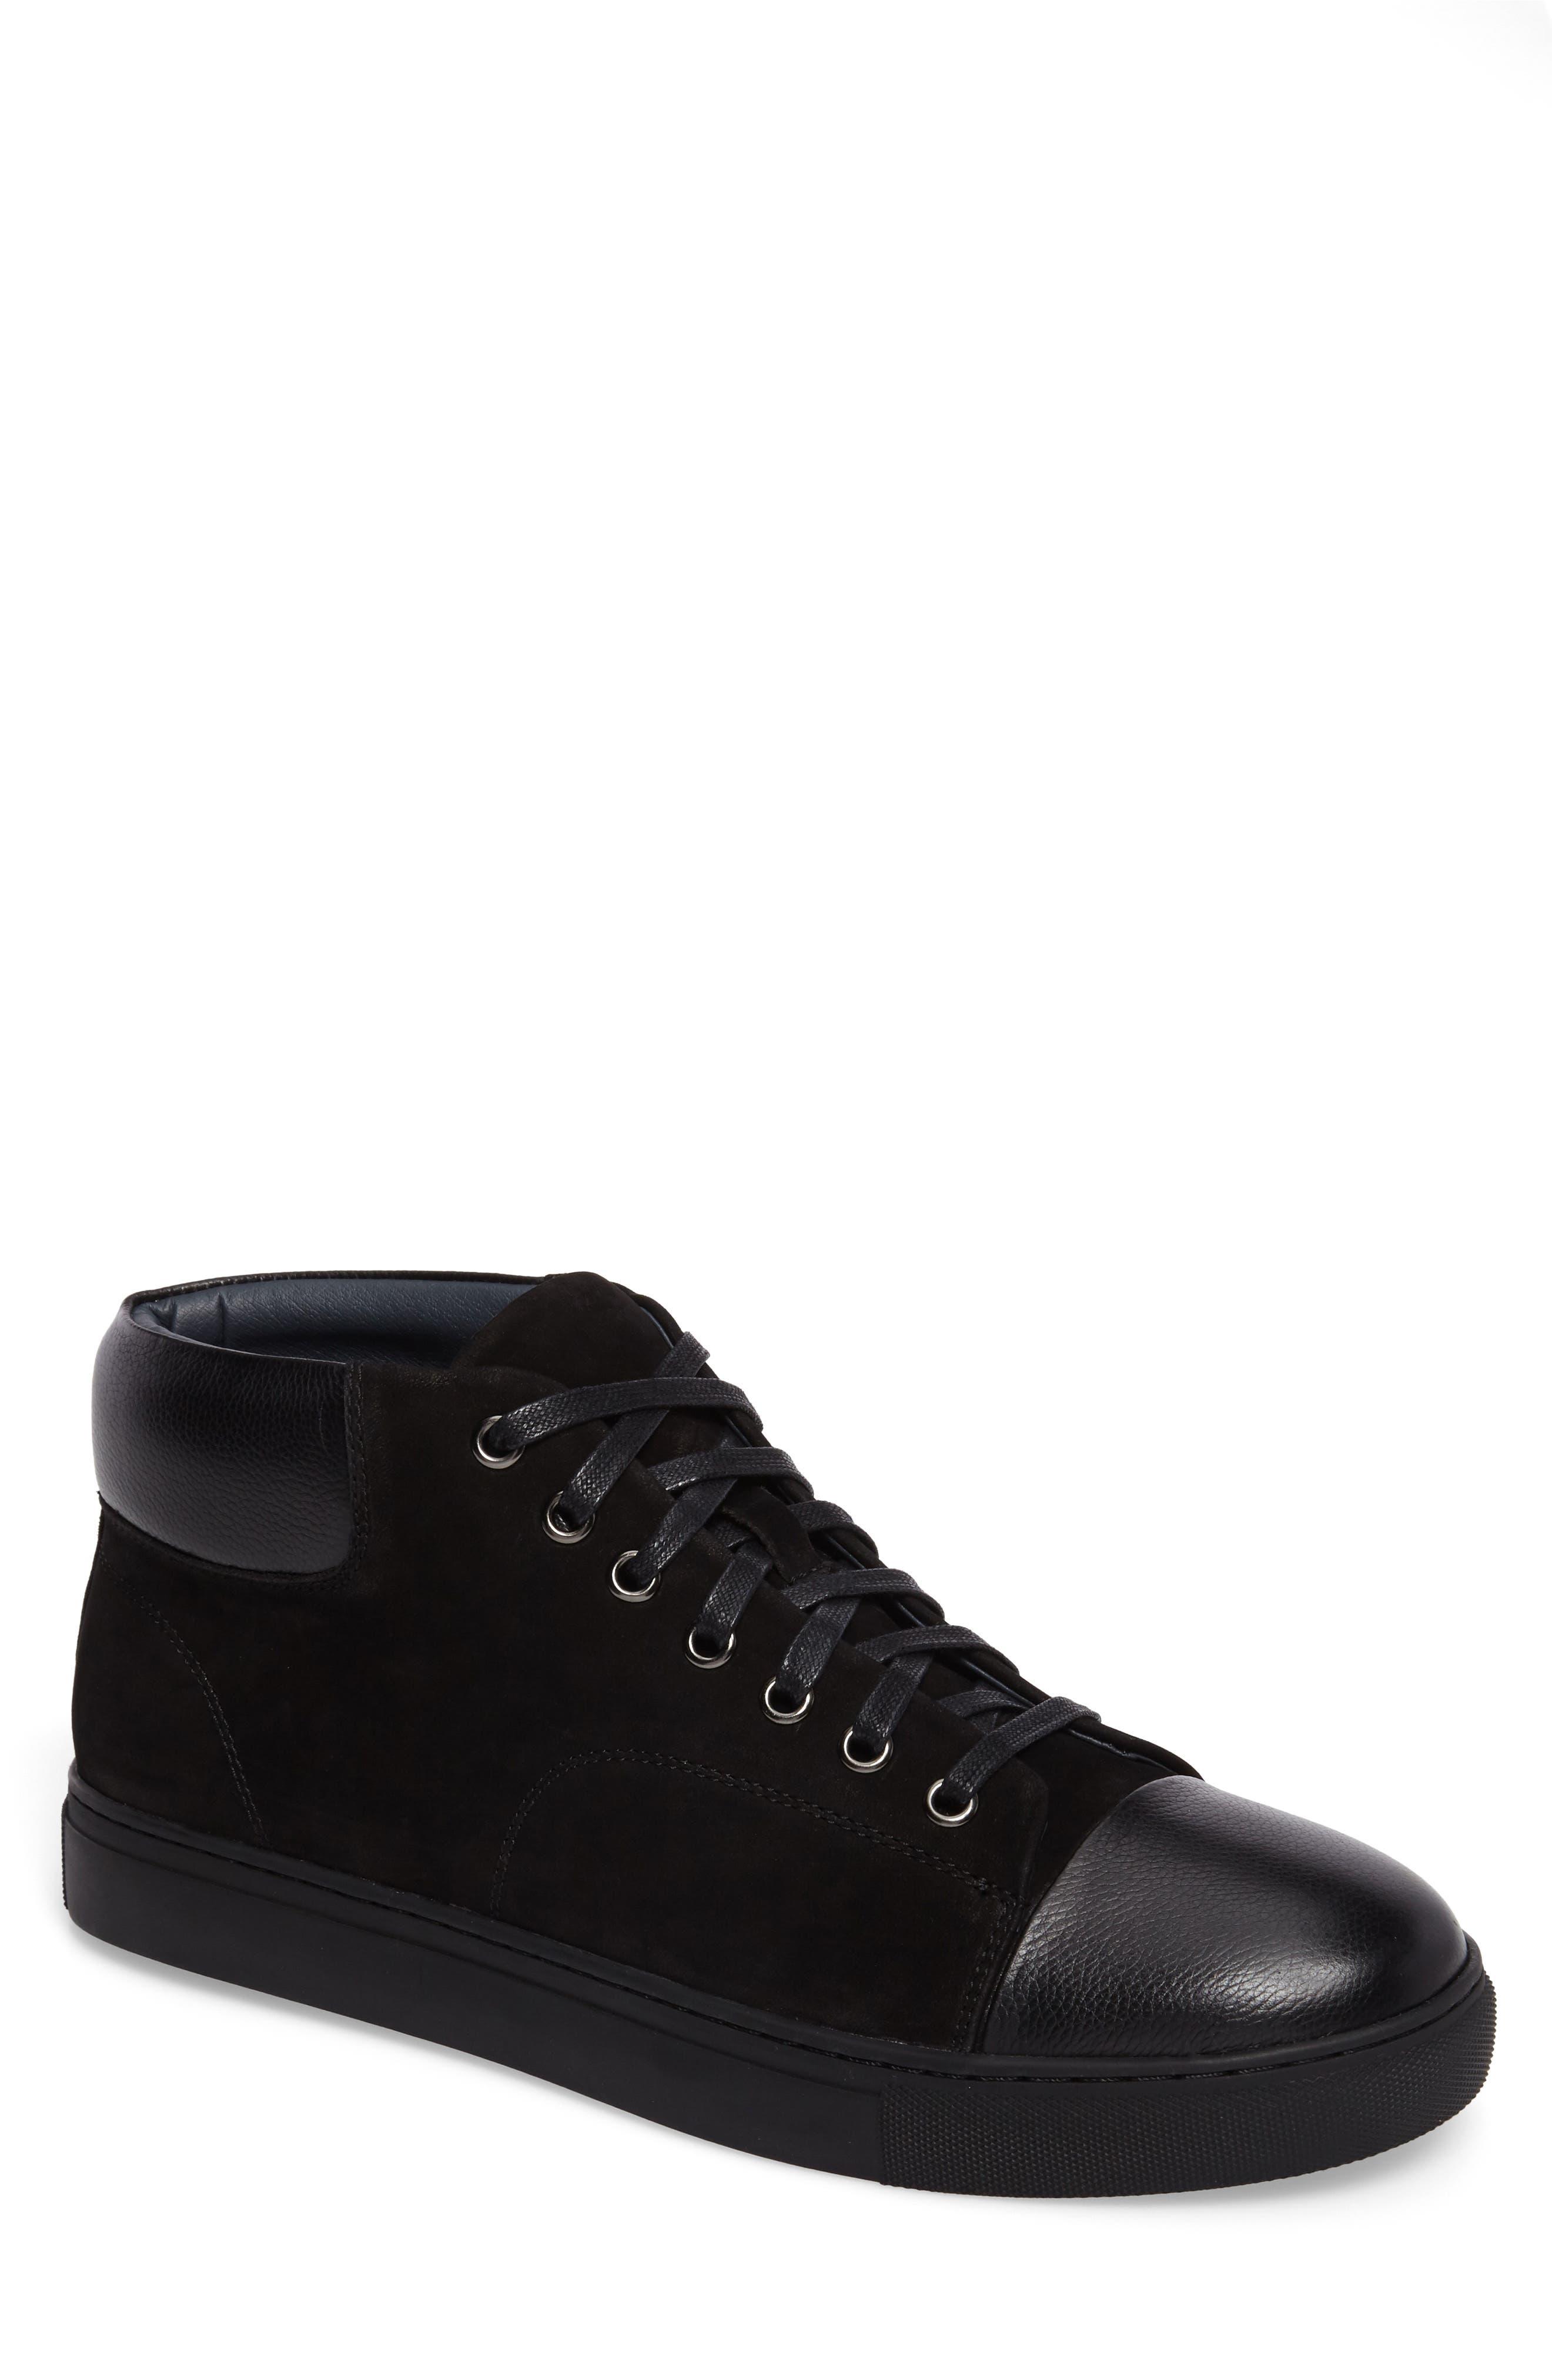 Landseer Sneaker,                             Main thumbnail 1, color,                             001